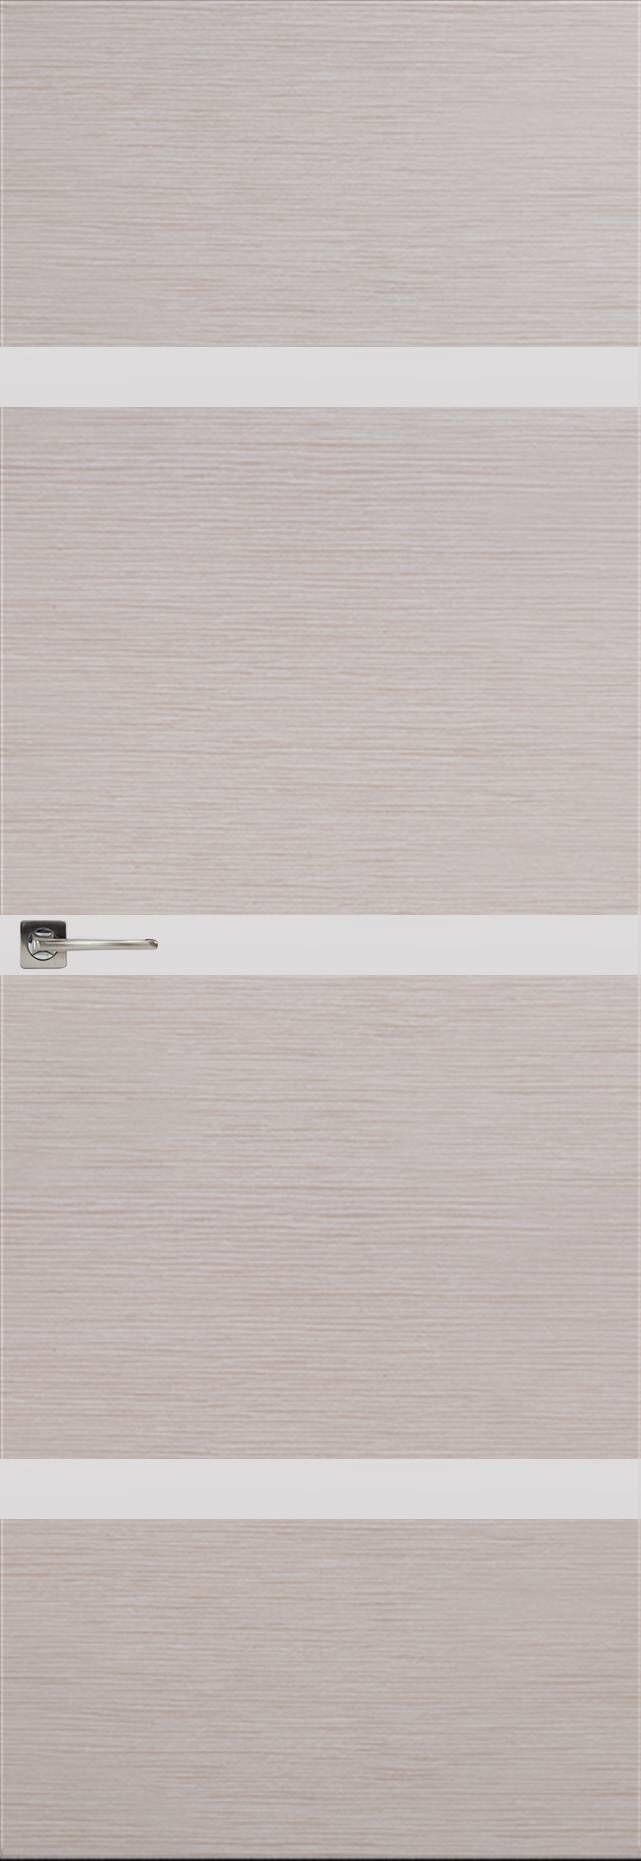 Tivoli Г-4 Invisible цвет - Дымчатый дуб Без стекла (ДГ)